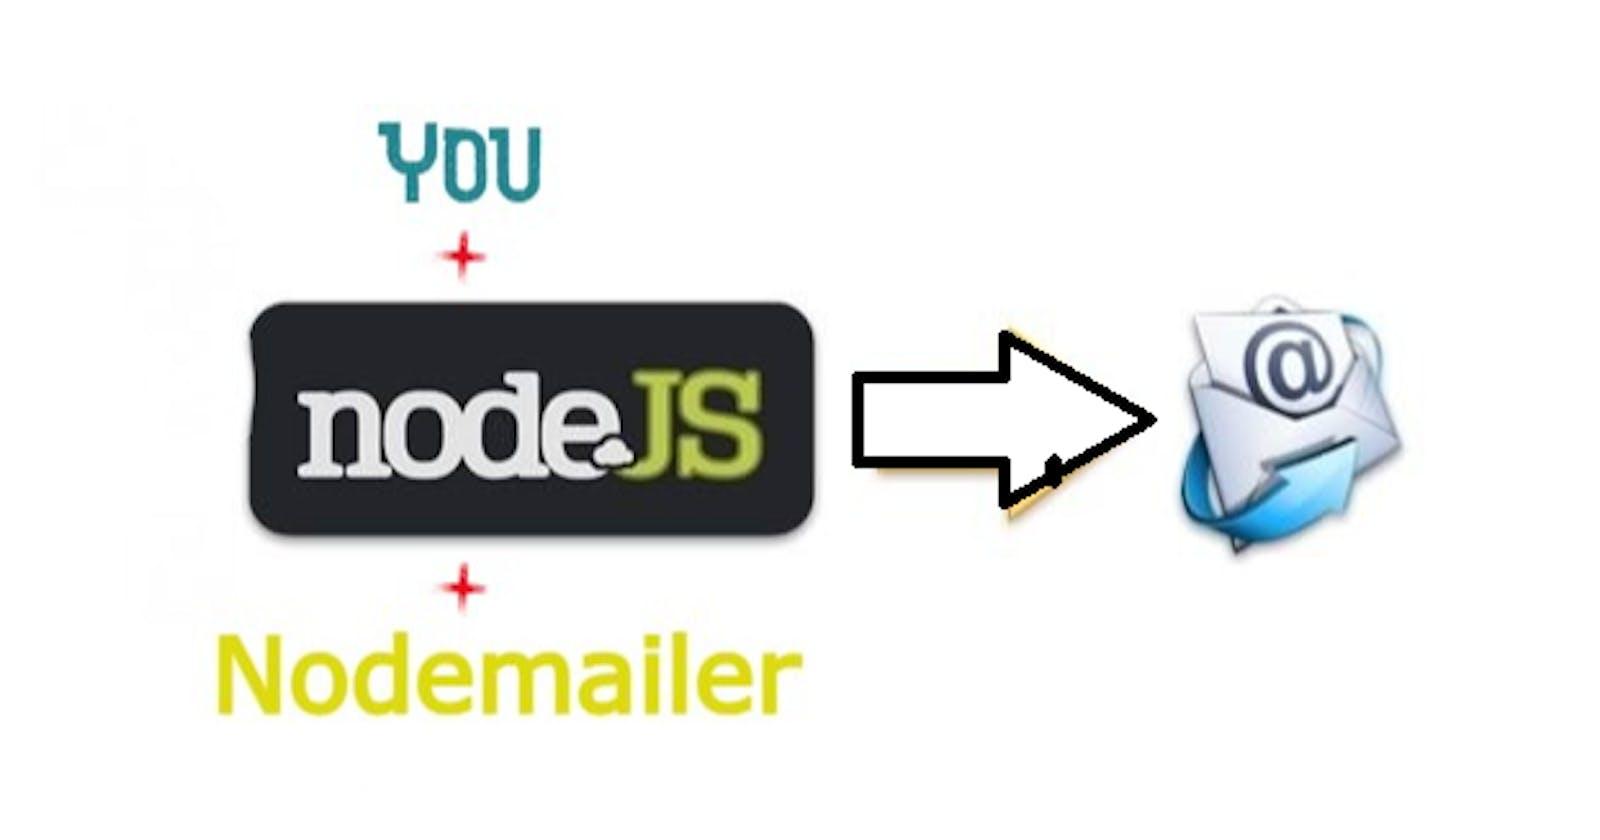 Setup a mailing service using NodeJS in 5 minutes